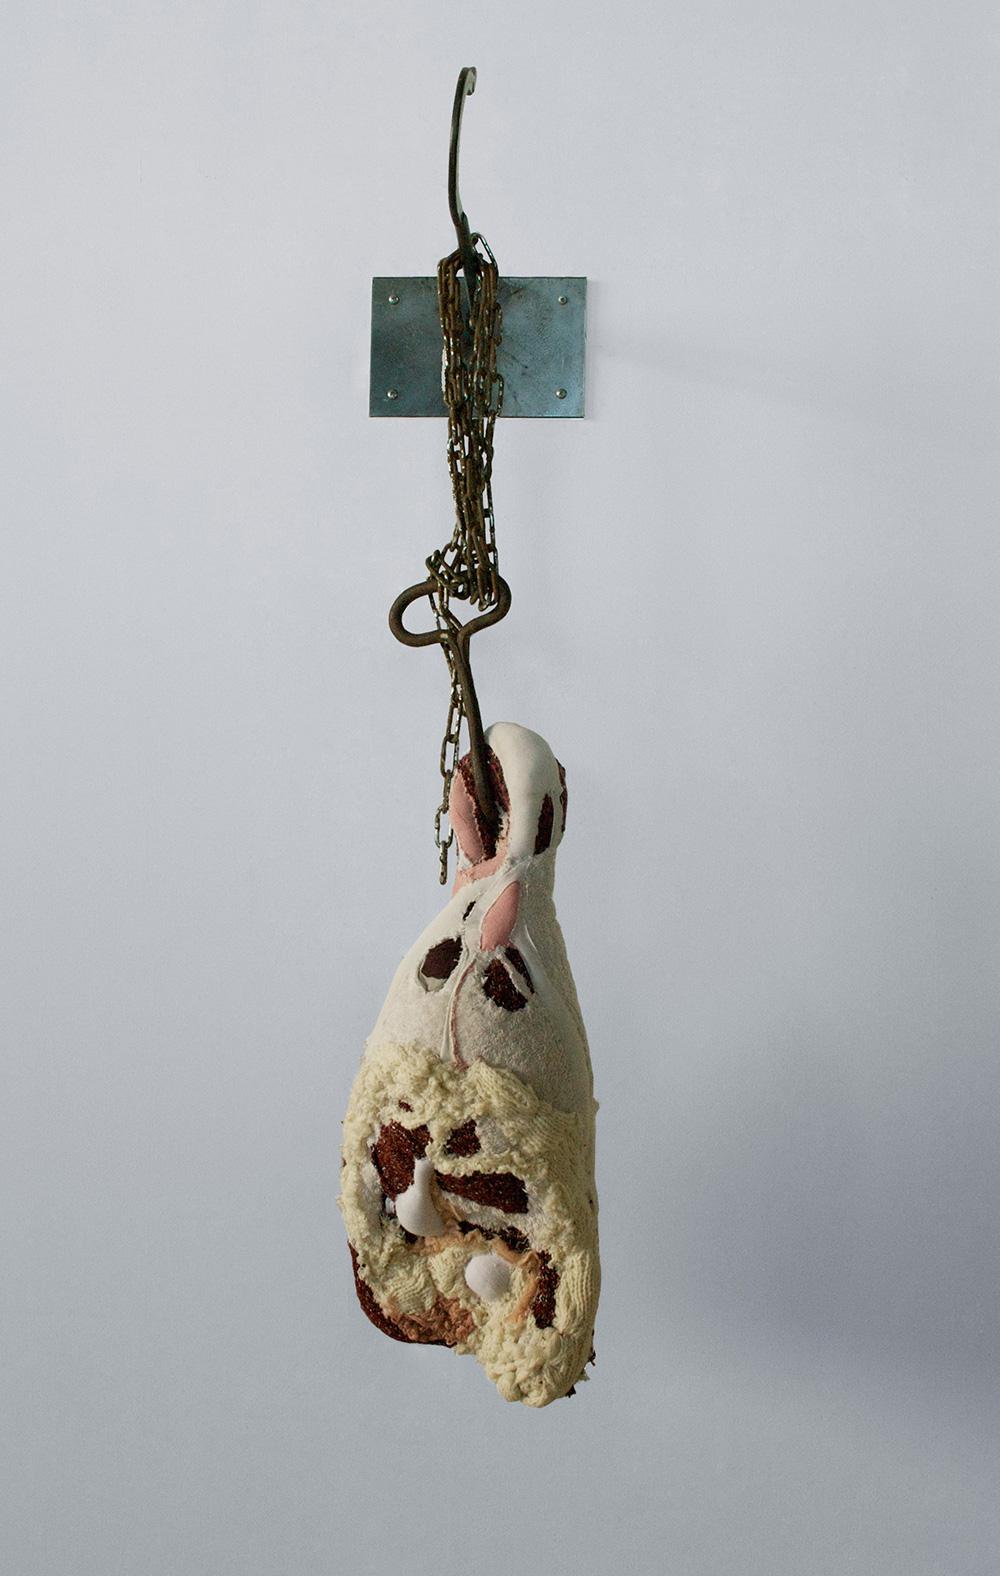 sculture-scarti-abiti-carcasse-animali-macello-actus-reus-tamara-kostianovsky-16